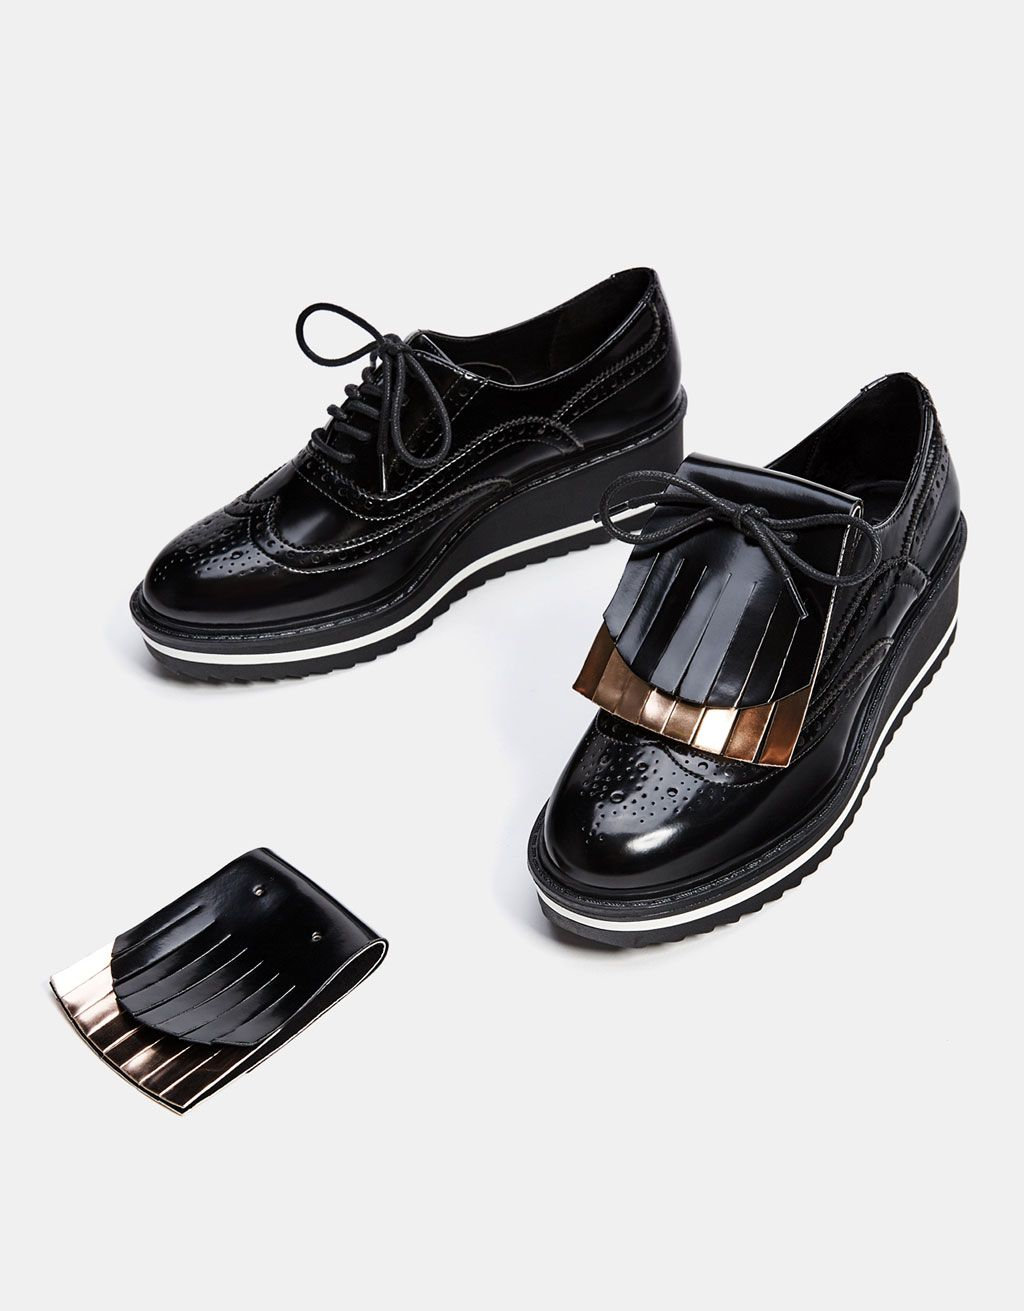 a91ea47f Bershka España - Blucher picados con solapa intercambiable y extraíble  Zapatos Planos, Plataformas, Tenis